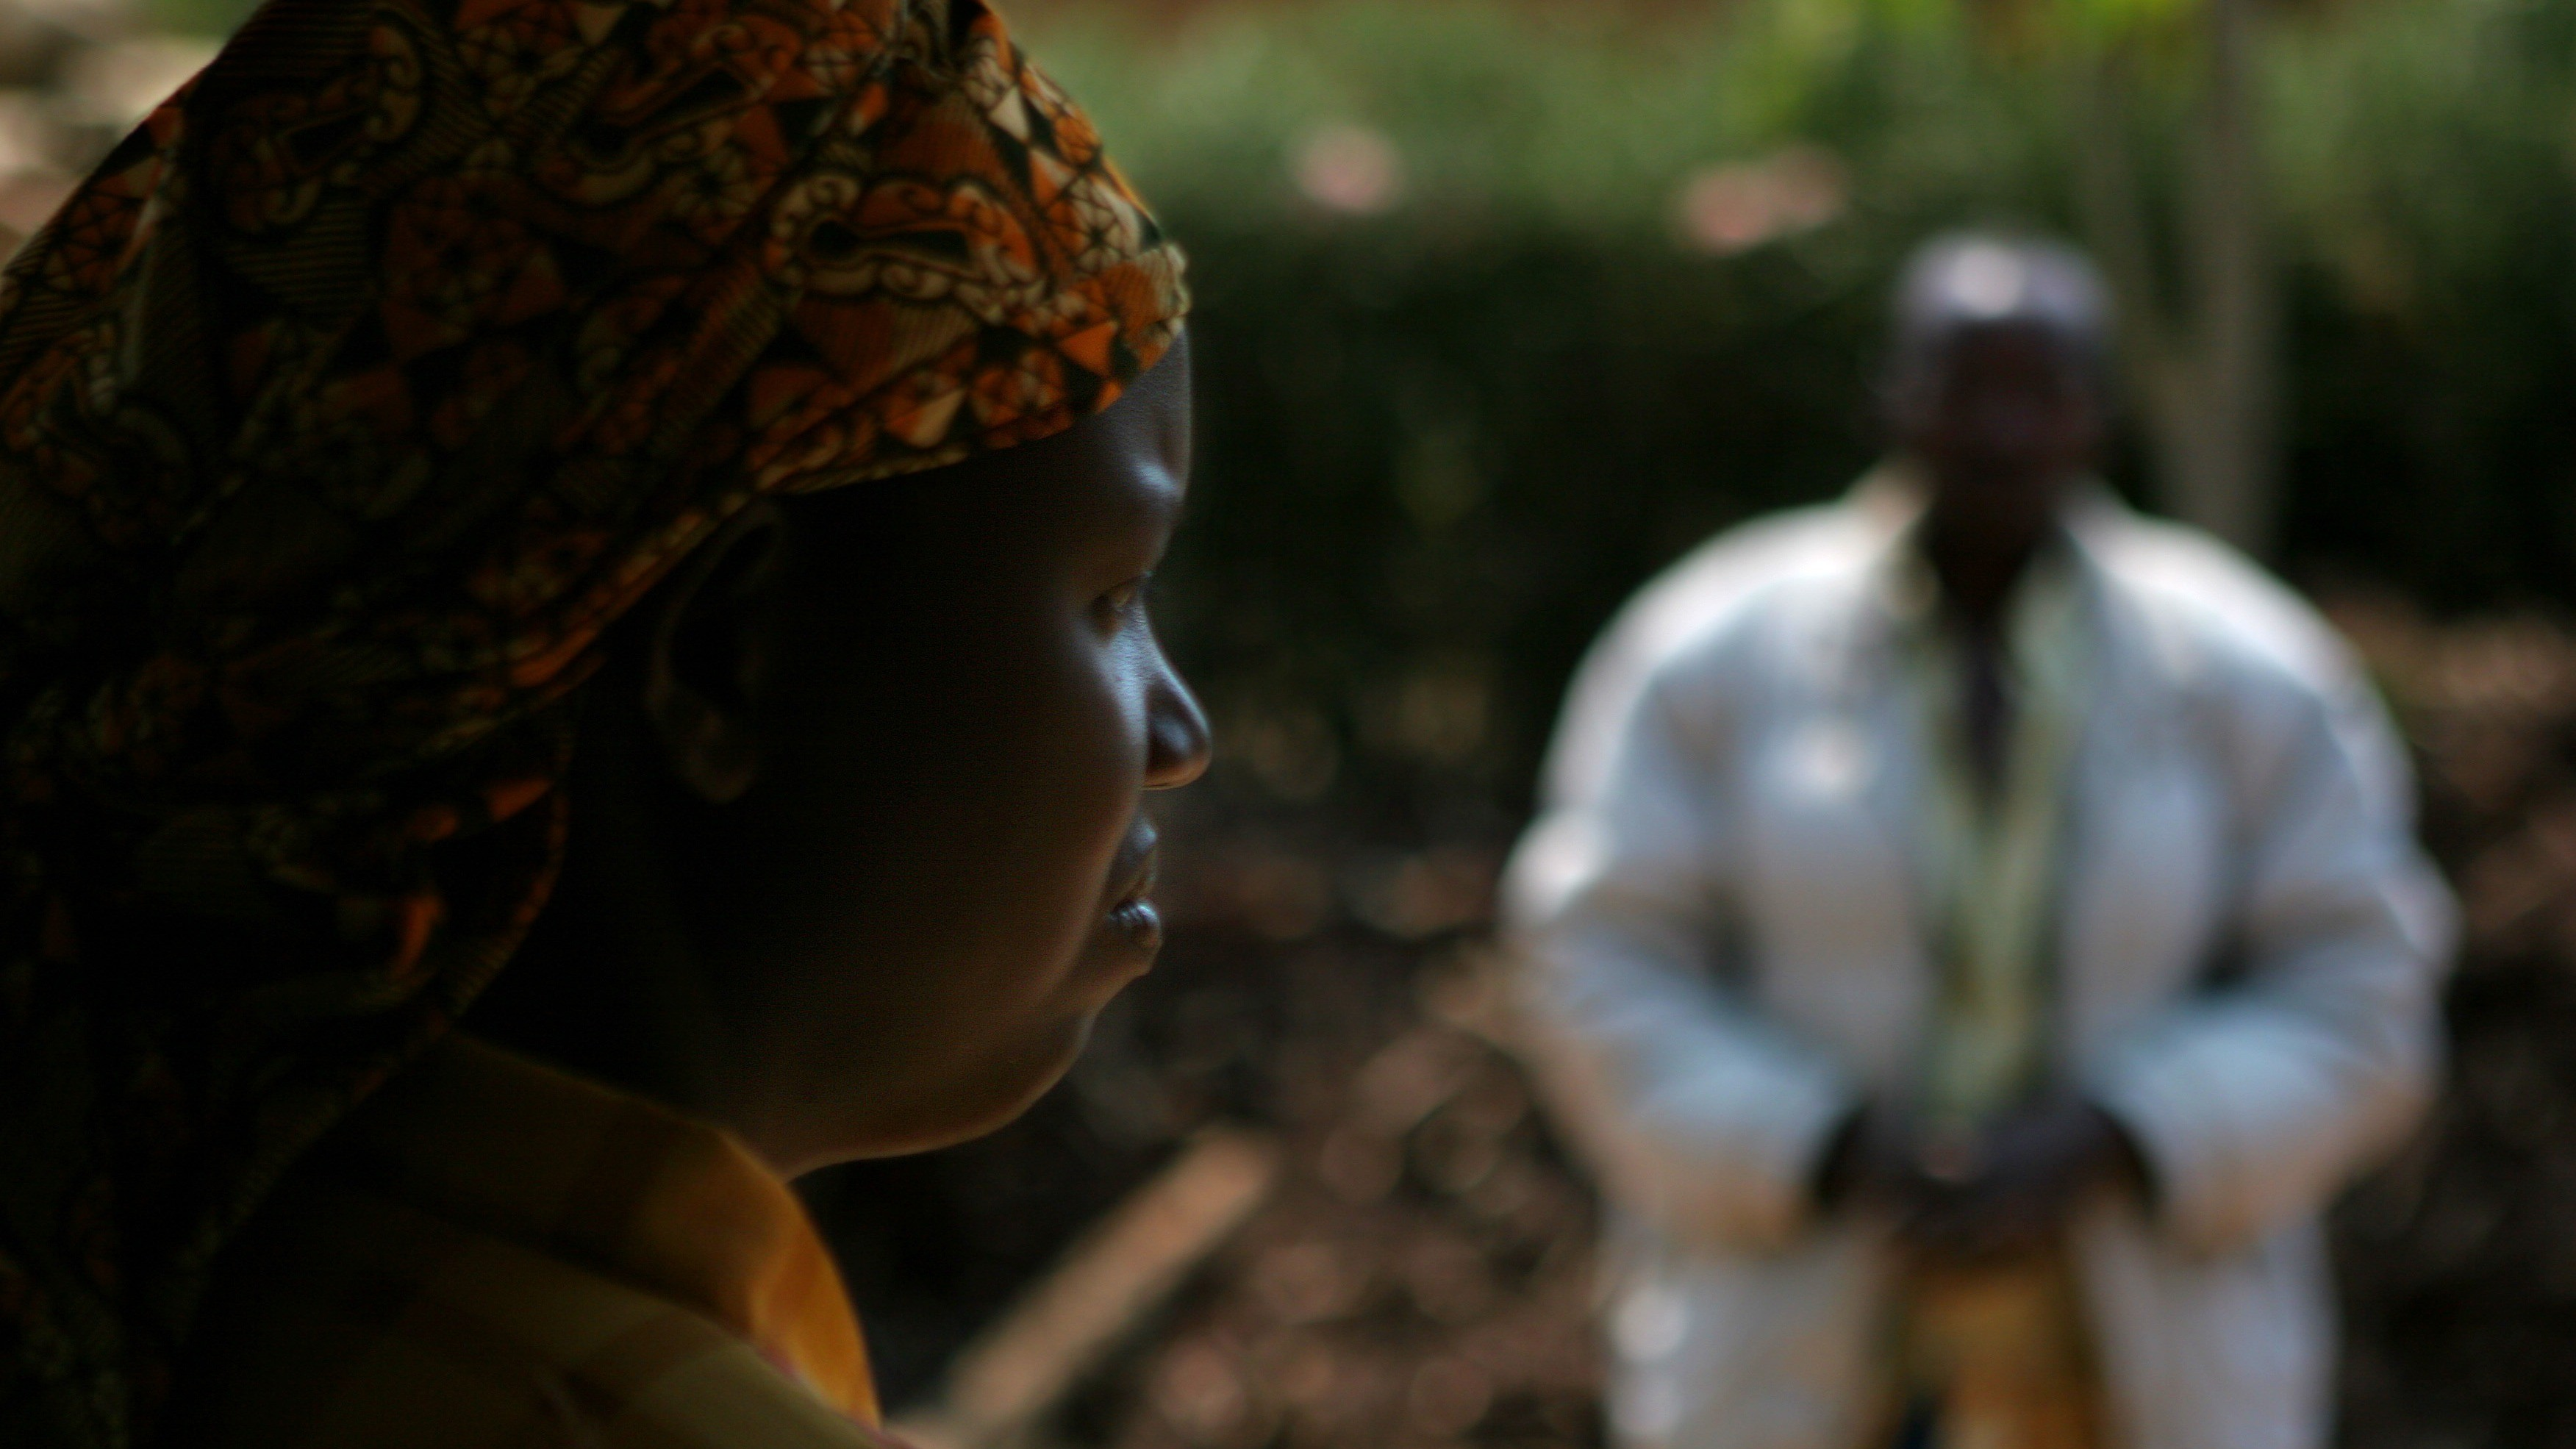 thesis on genocide in rwanda